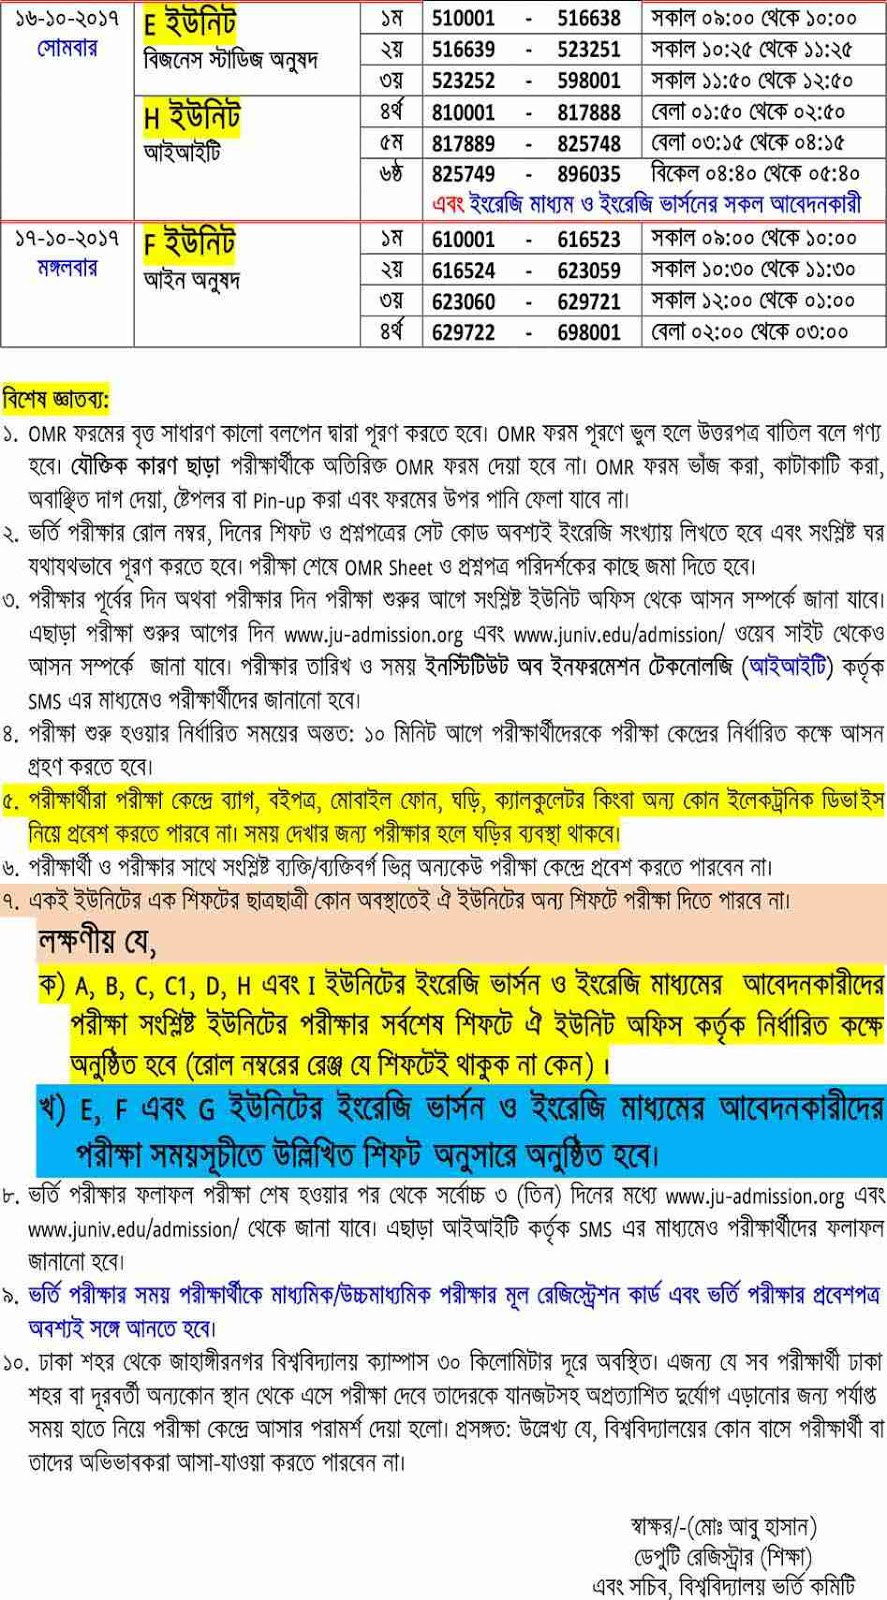 jahangirnagar-university-admission-routine